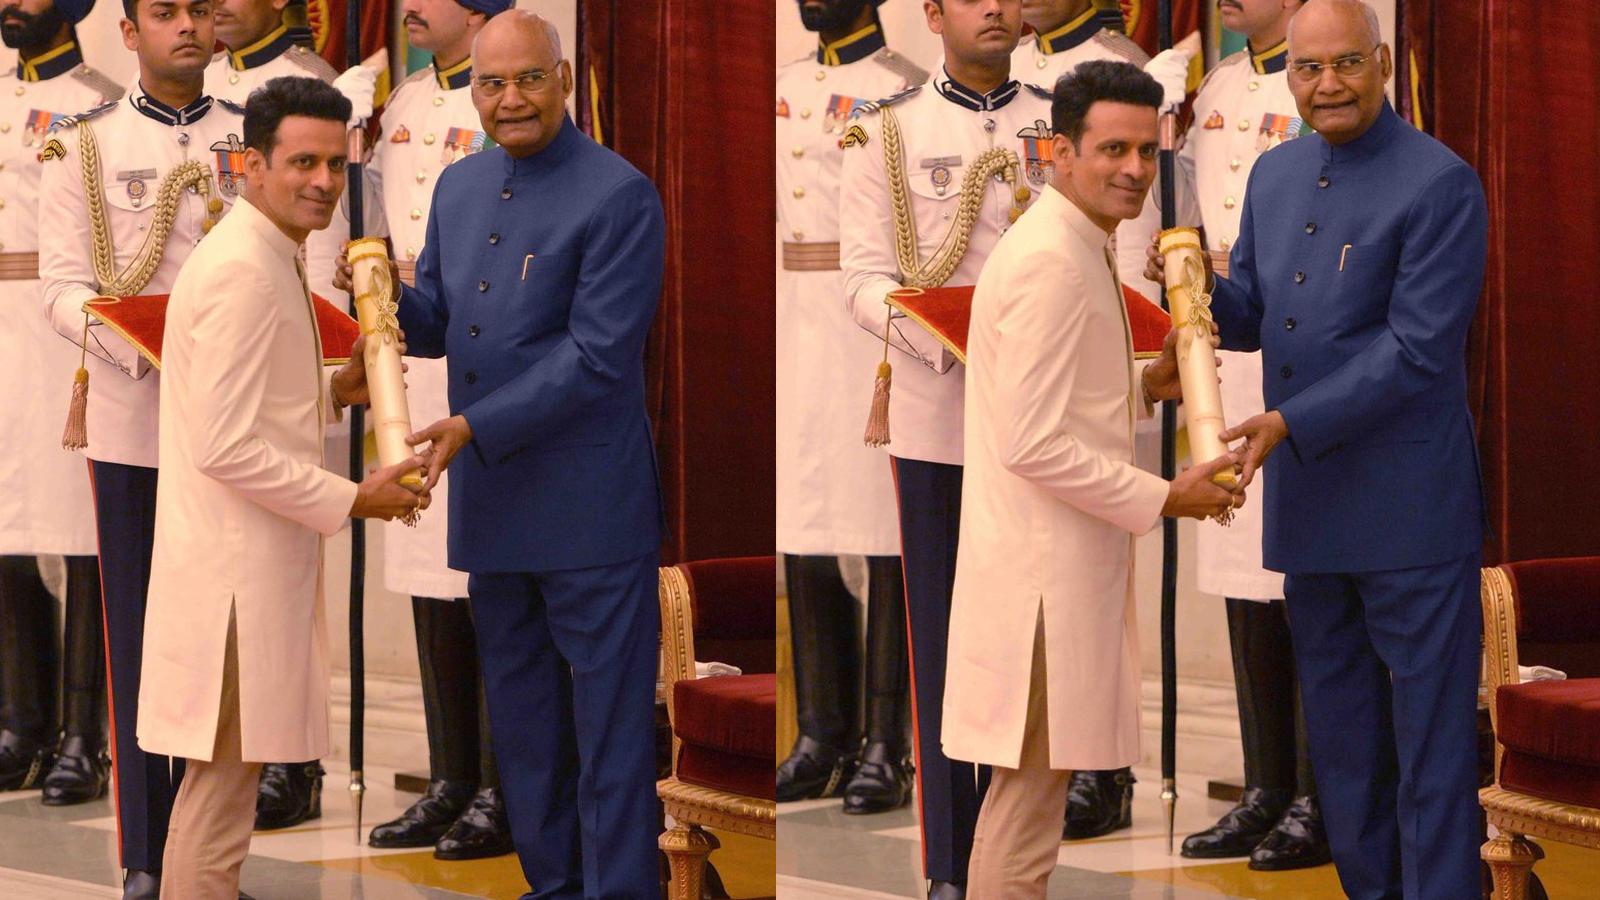 Celebrities congratulate Manoj Bajpayee on receiving Padma Shri